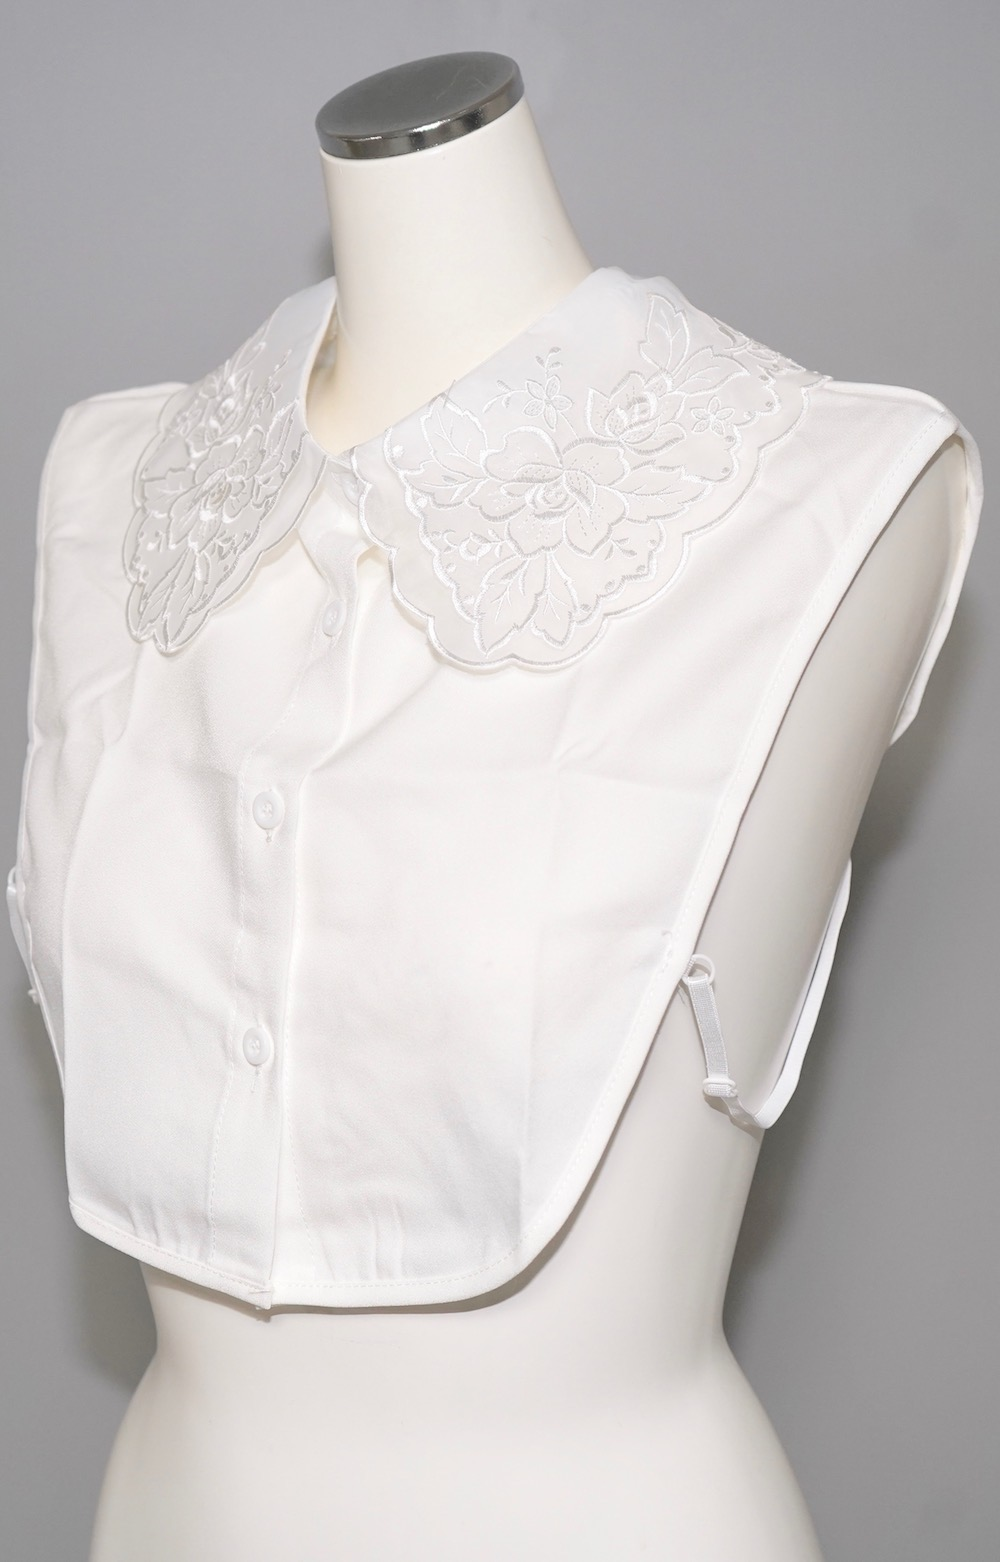 Flower Organdy Big Collar (white)